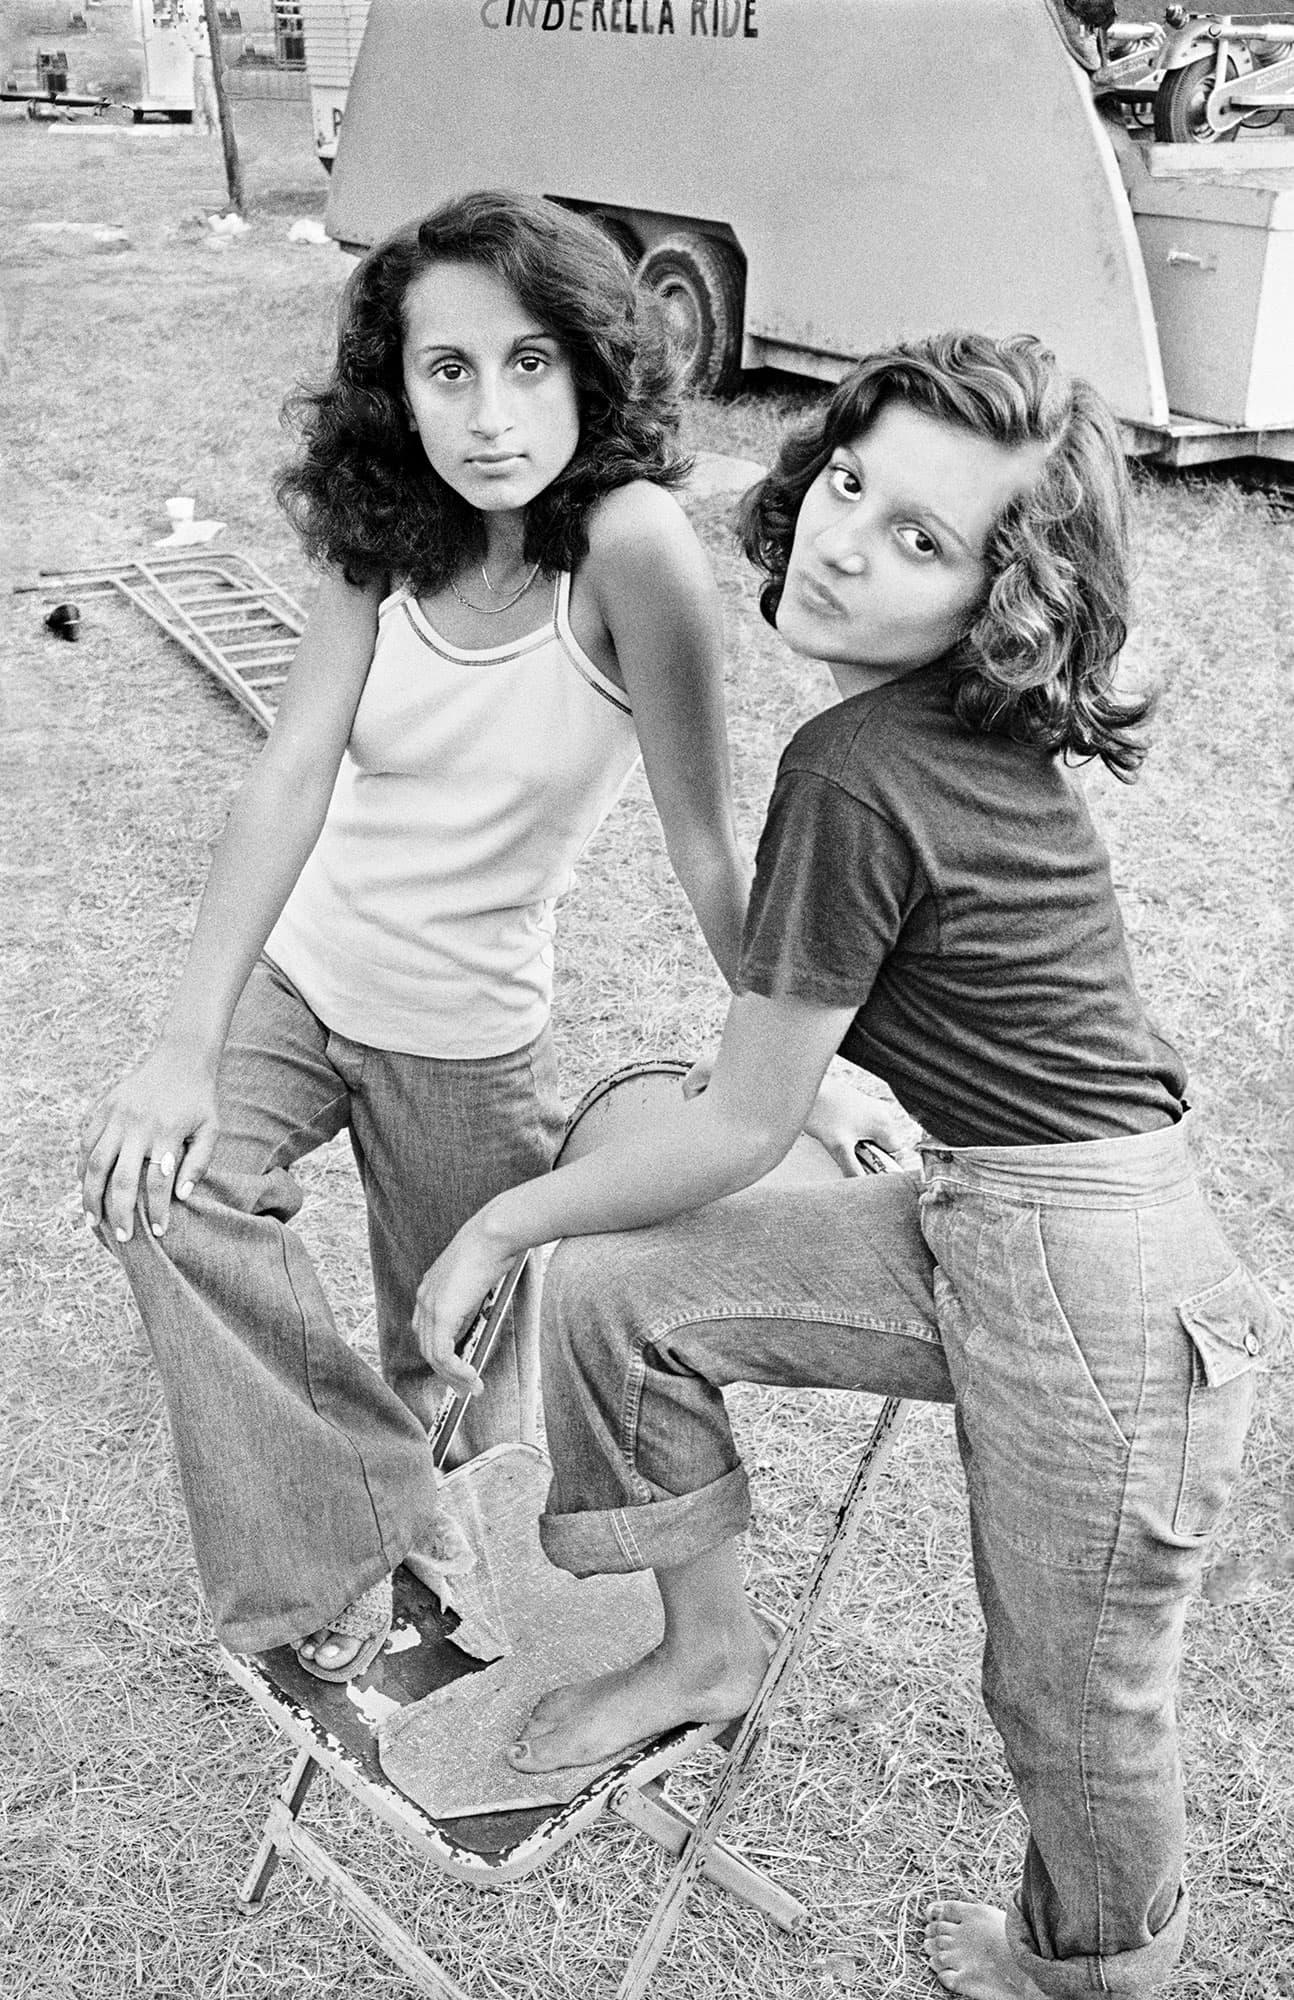 arthur-lazar-Carnival-Girls-Ohio-1976